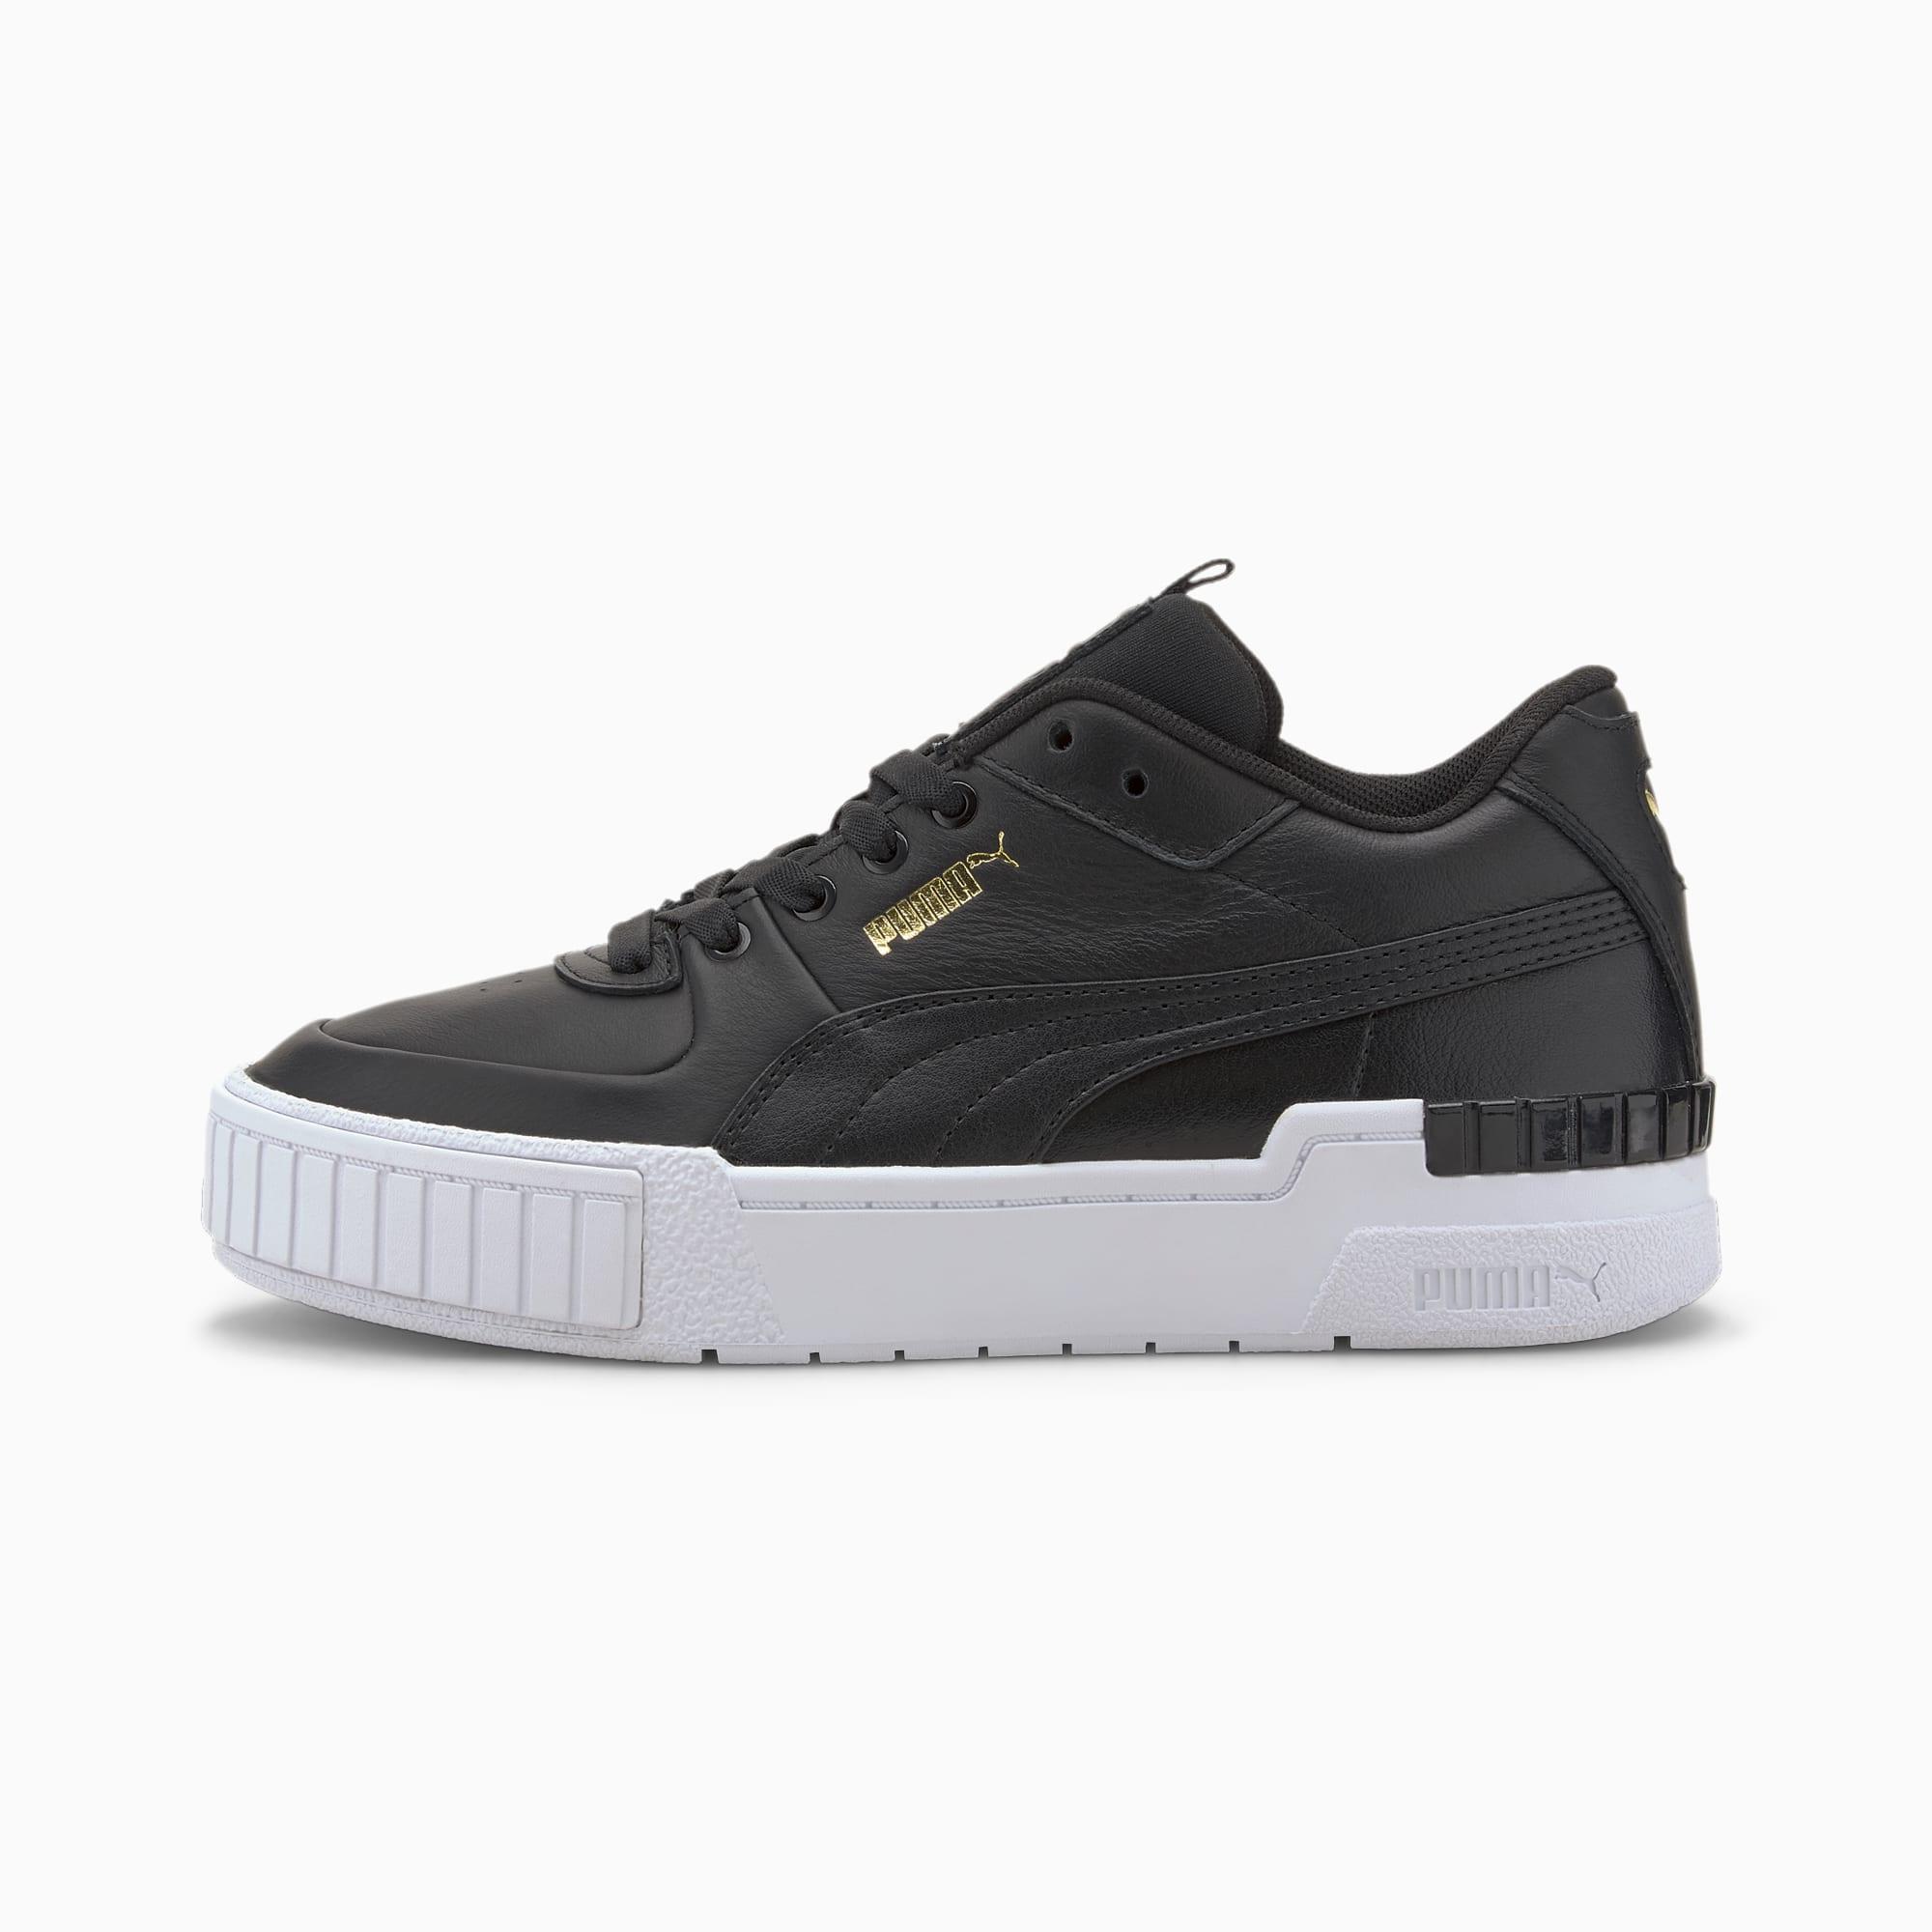 PUMA Cali Sport Damen Sneaker Schuhe | Mit Aucun | Schwarz/Weiß | Größe: 39